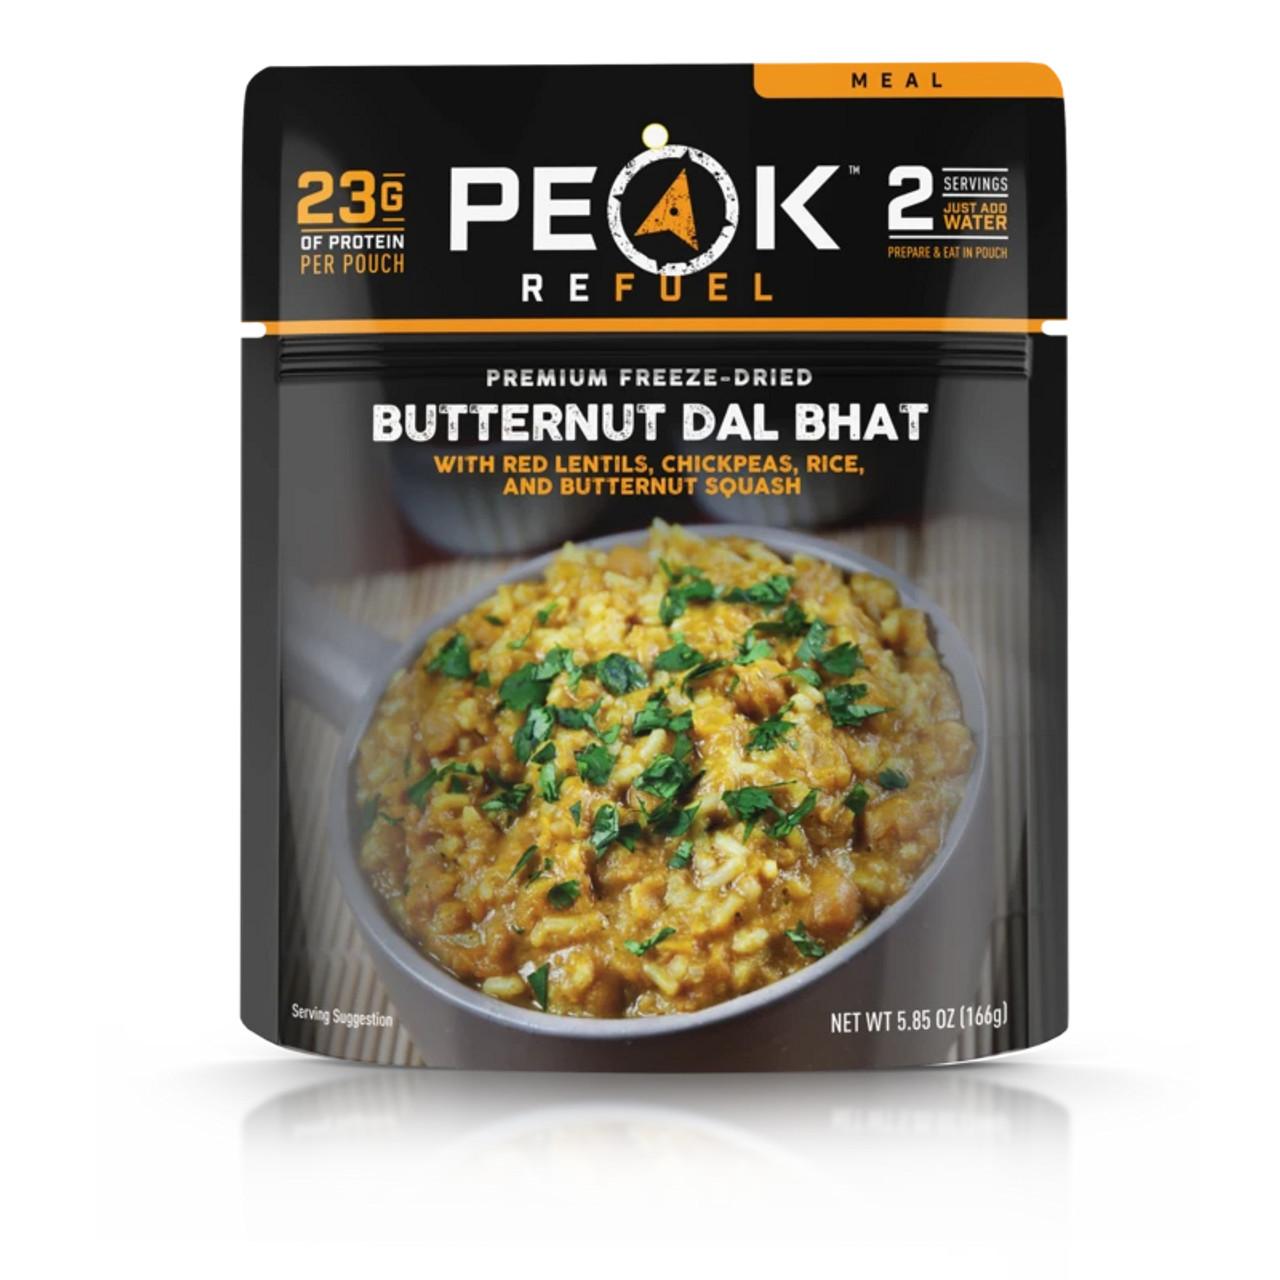 Peak Refuel Butternut Dal Bhat (VEGAN)